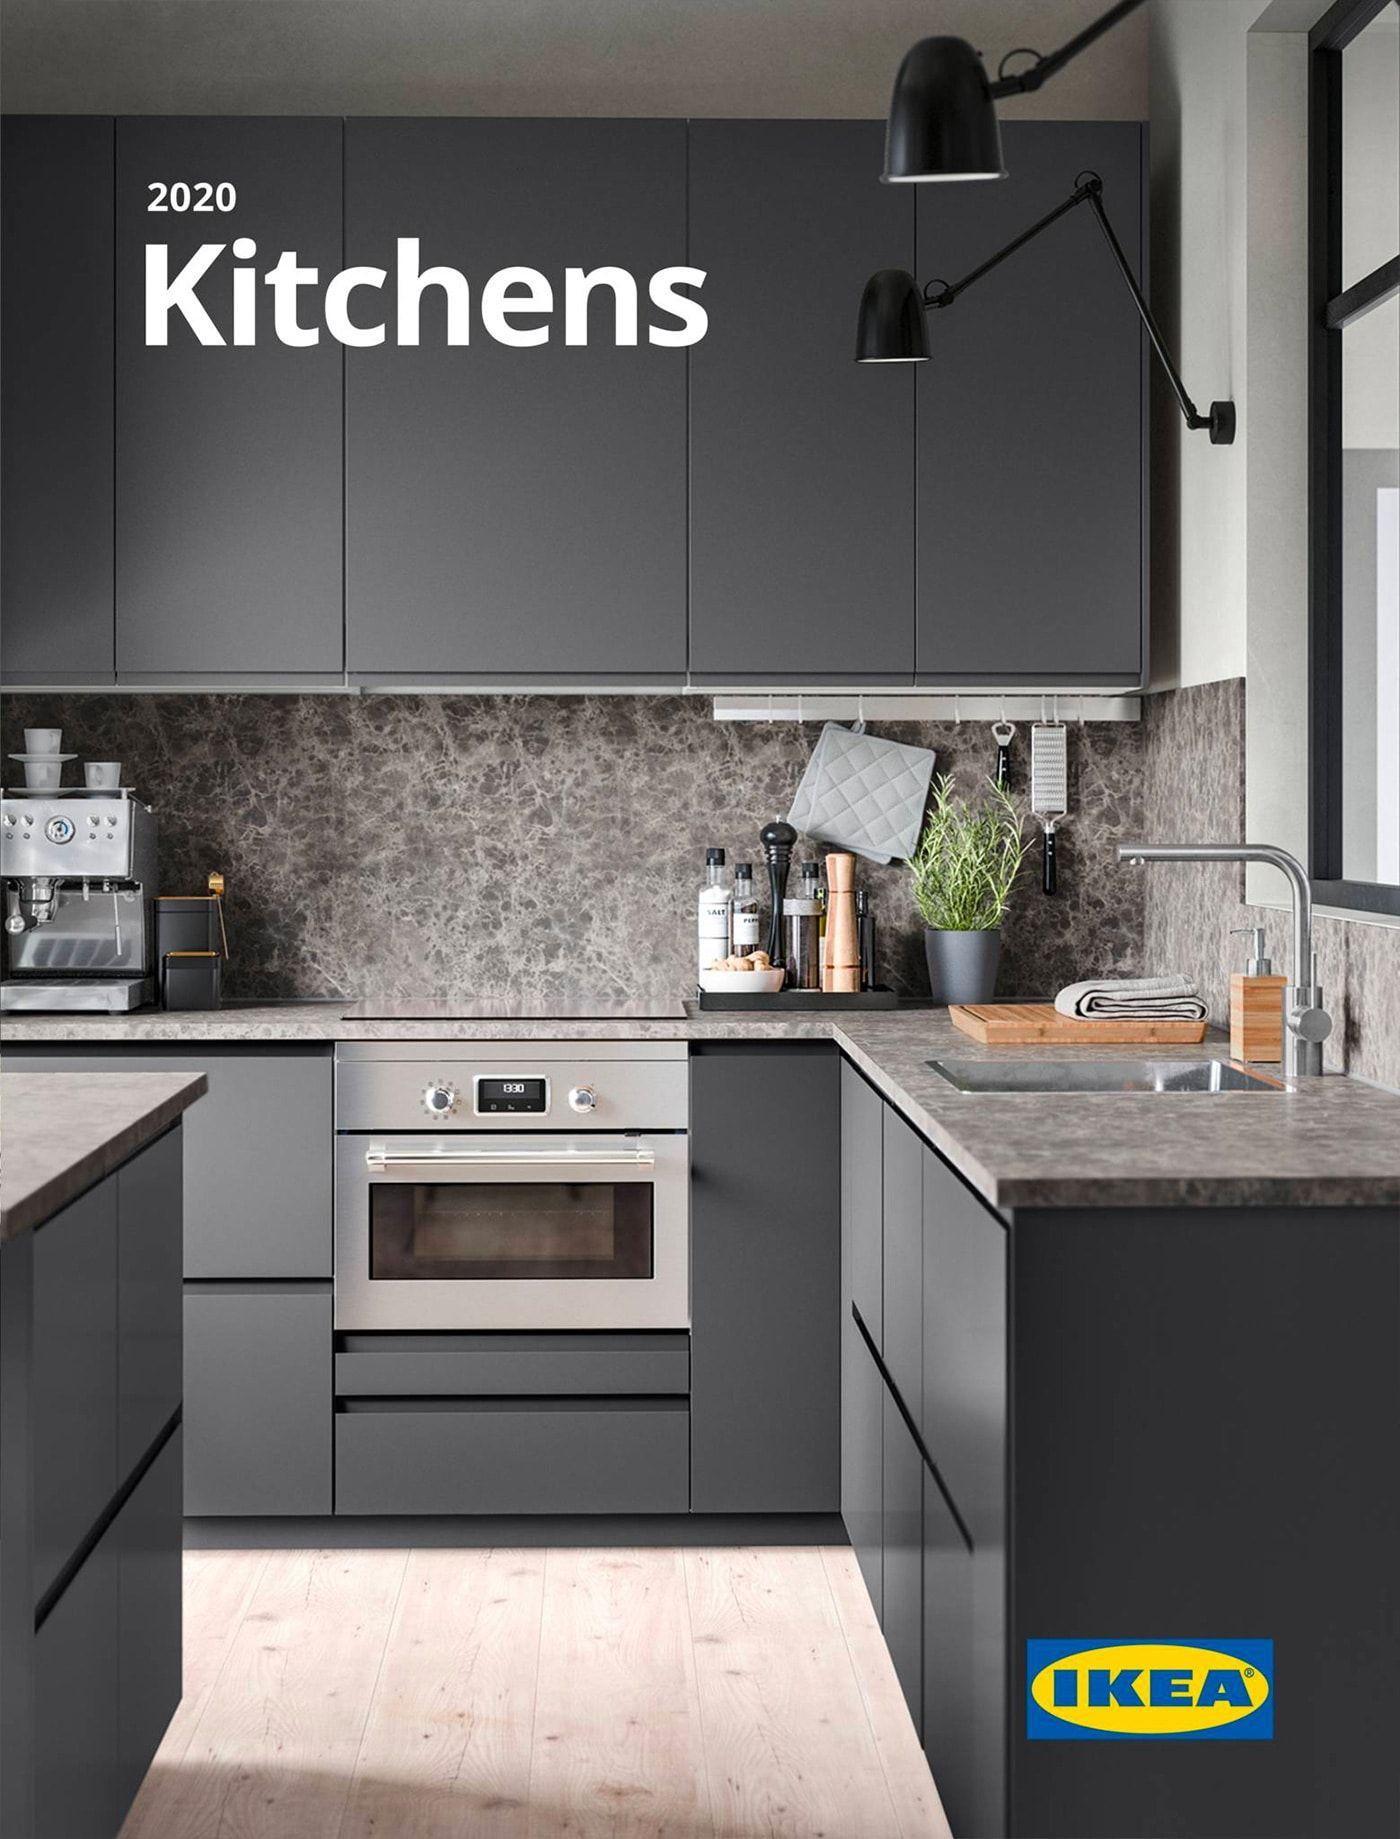 Catalogue And Brochures Ikea Kitchen Catalogue Kitchen Inspiration Design Modern Kitchen Cabinet Design